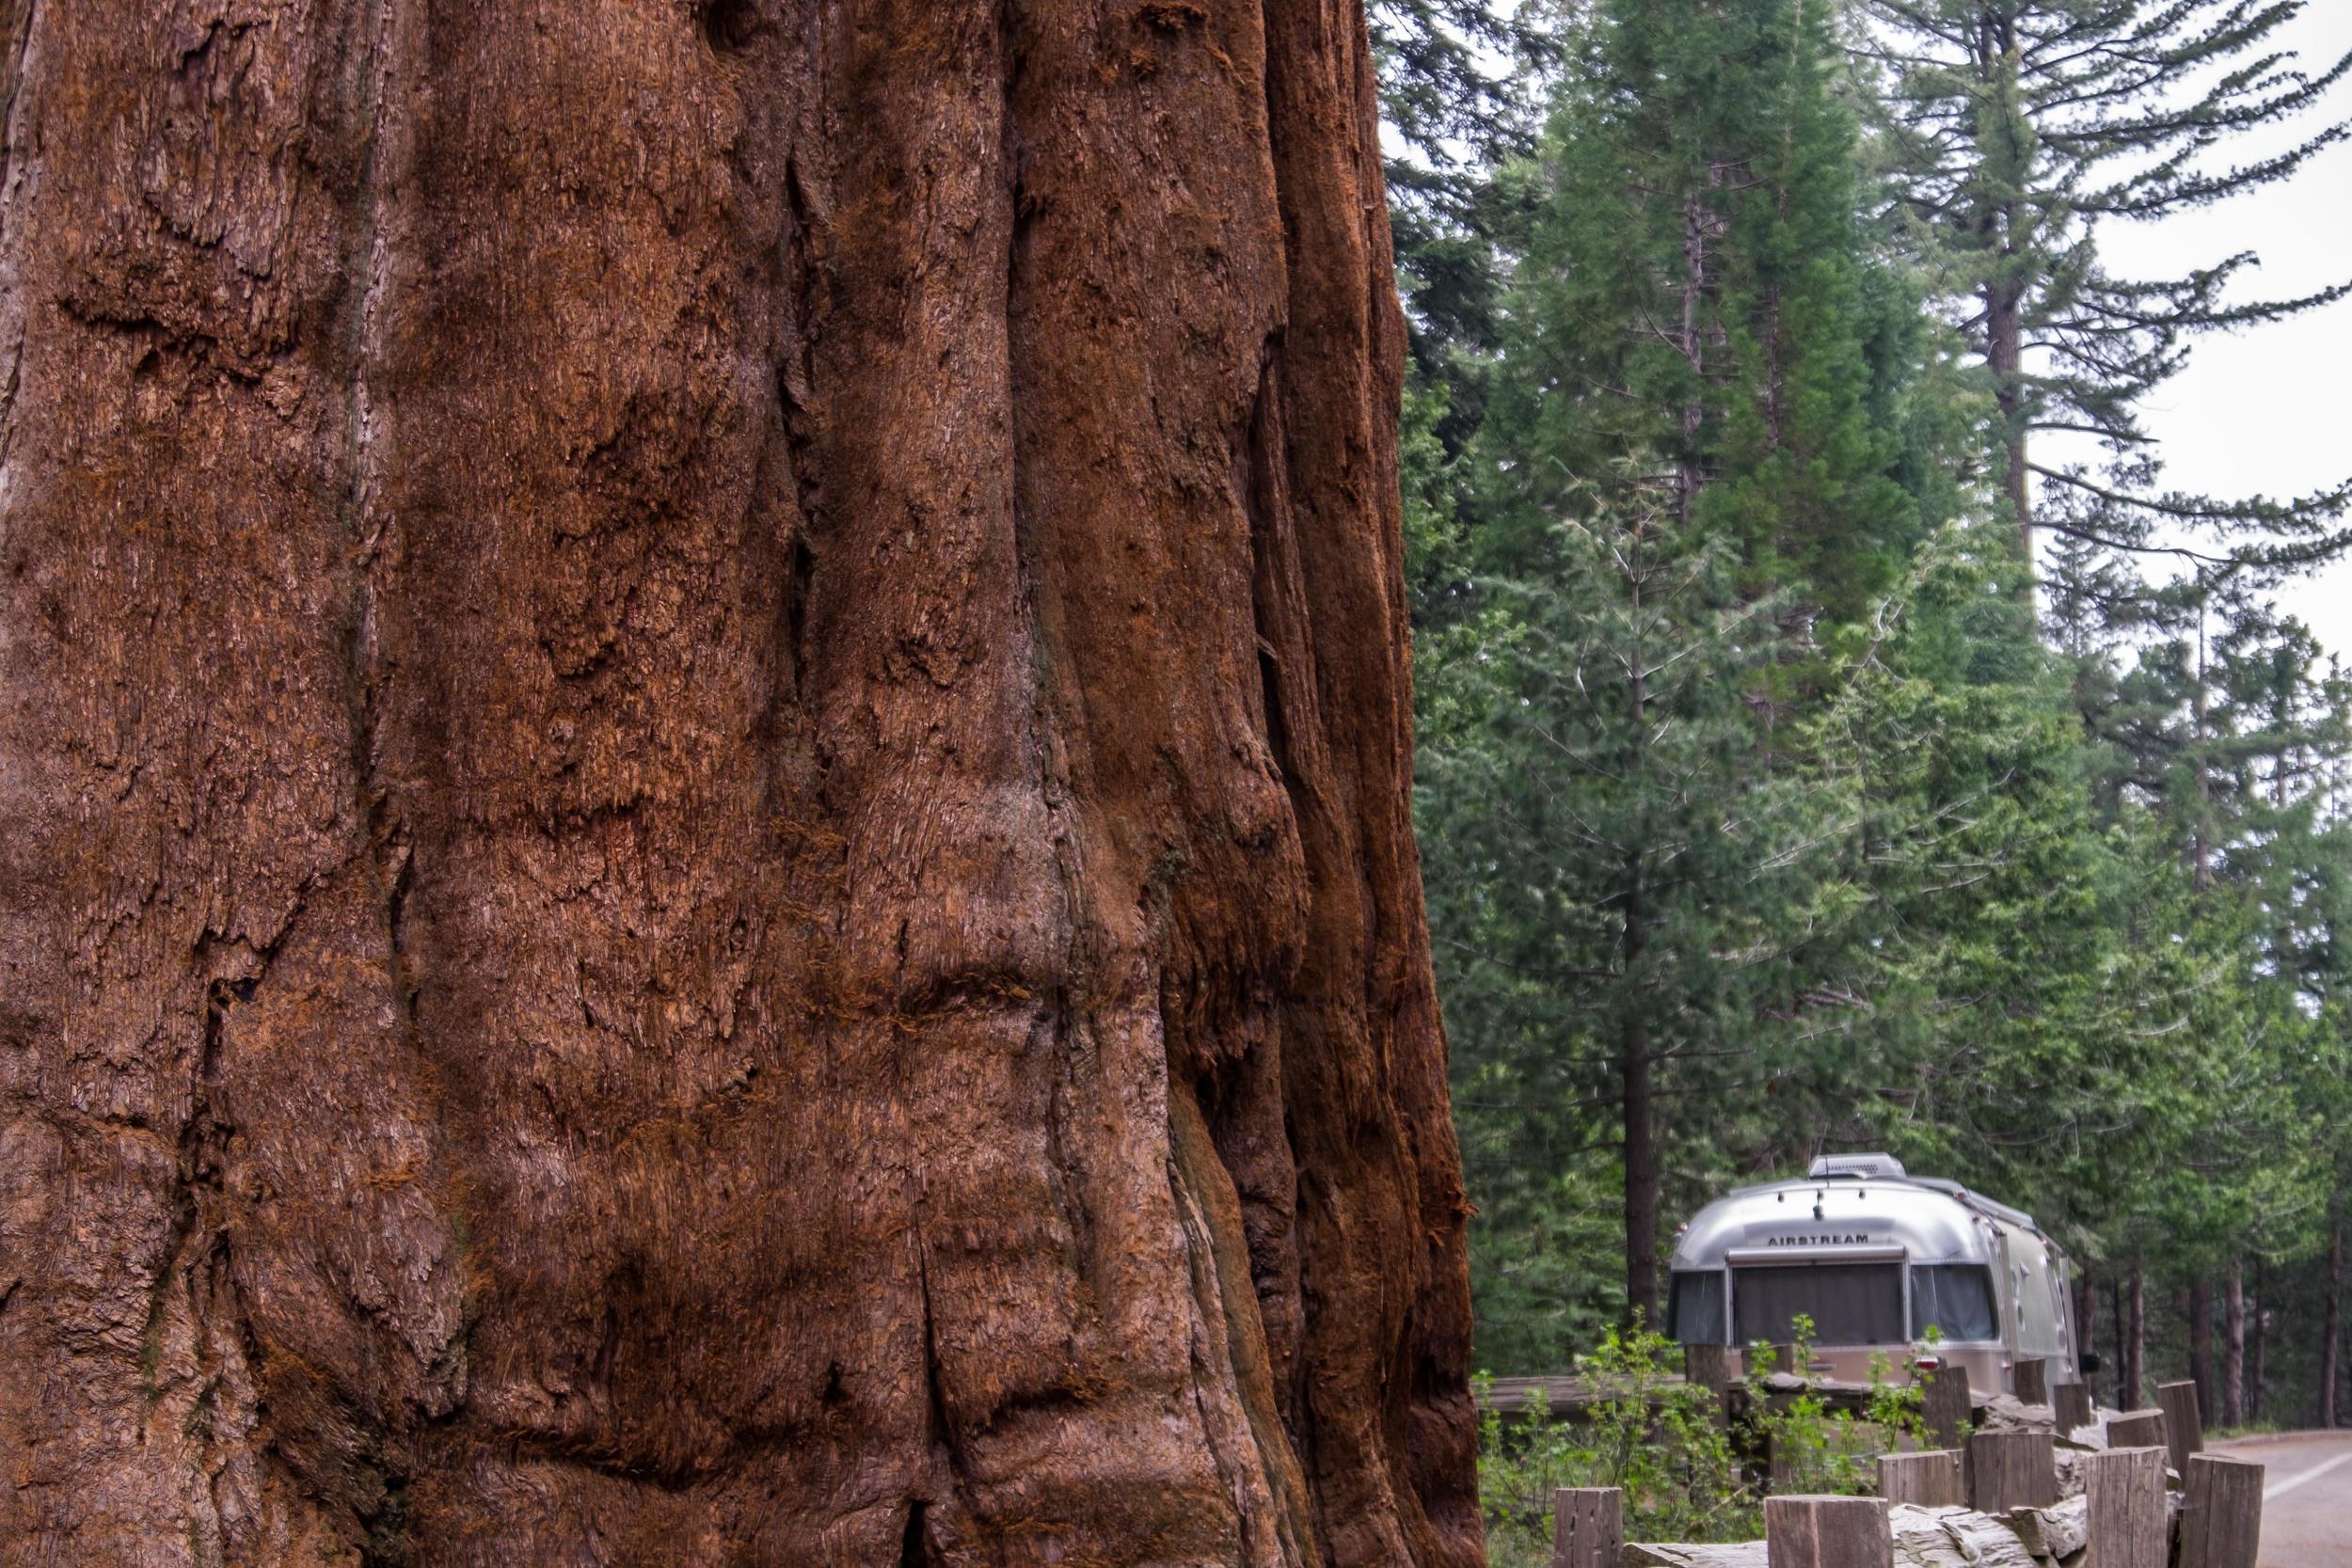 Wally dwarfed beneath the giant Sequoia trees.